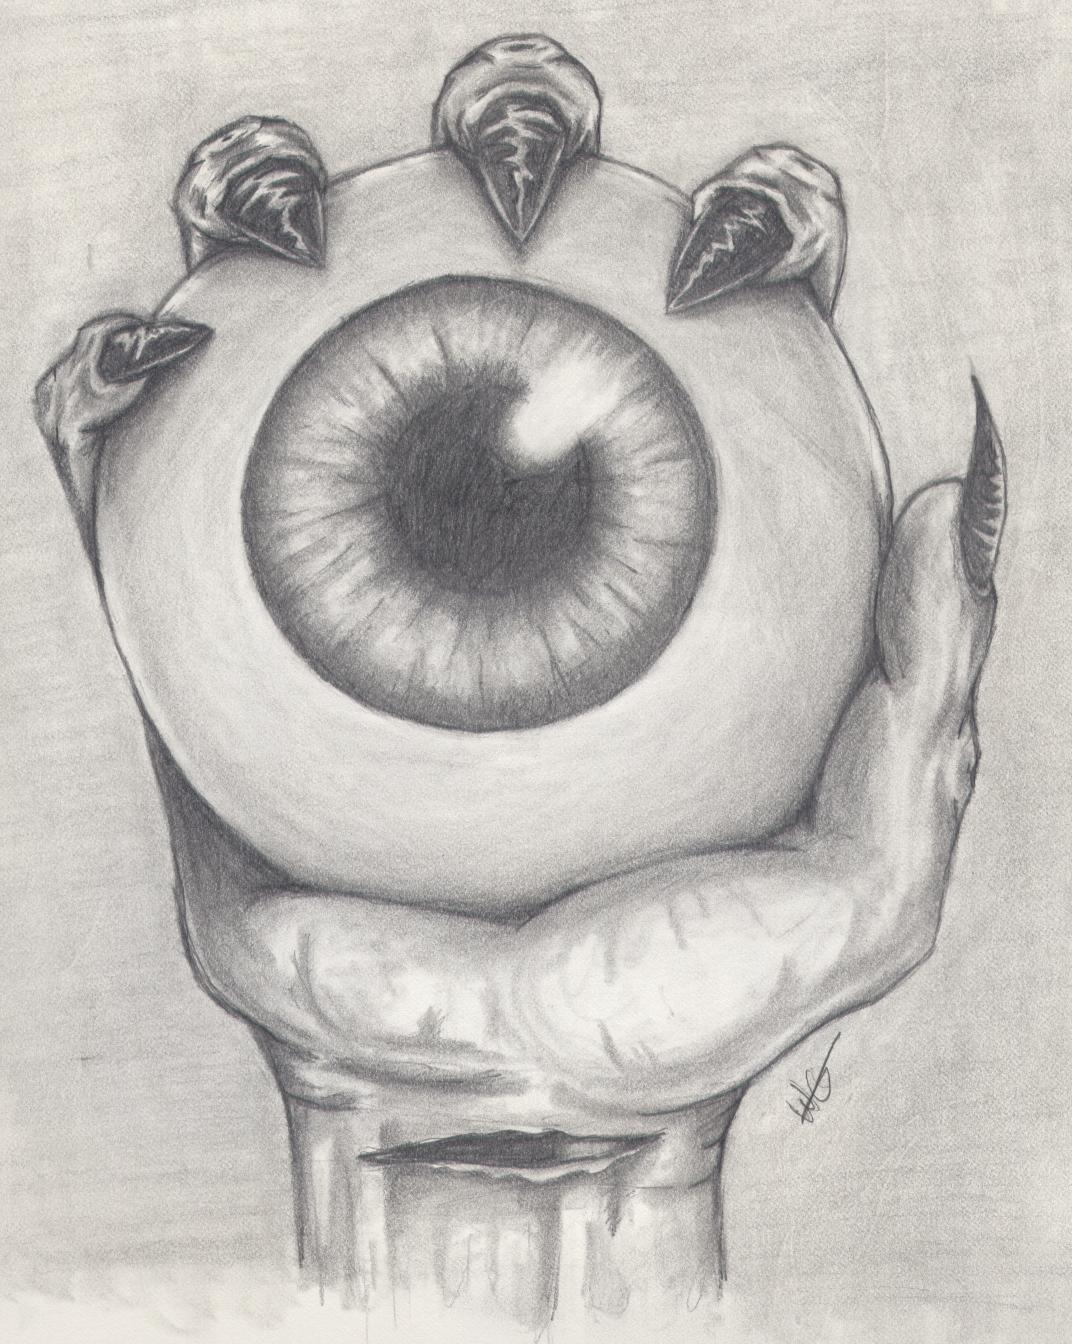 Drawn eyeball hand Hand thingy eye hand on